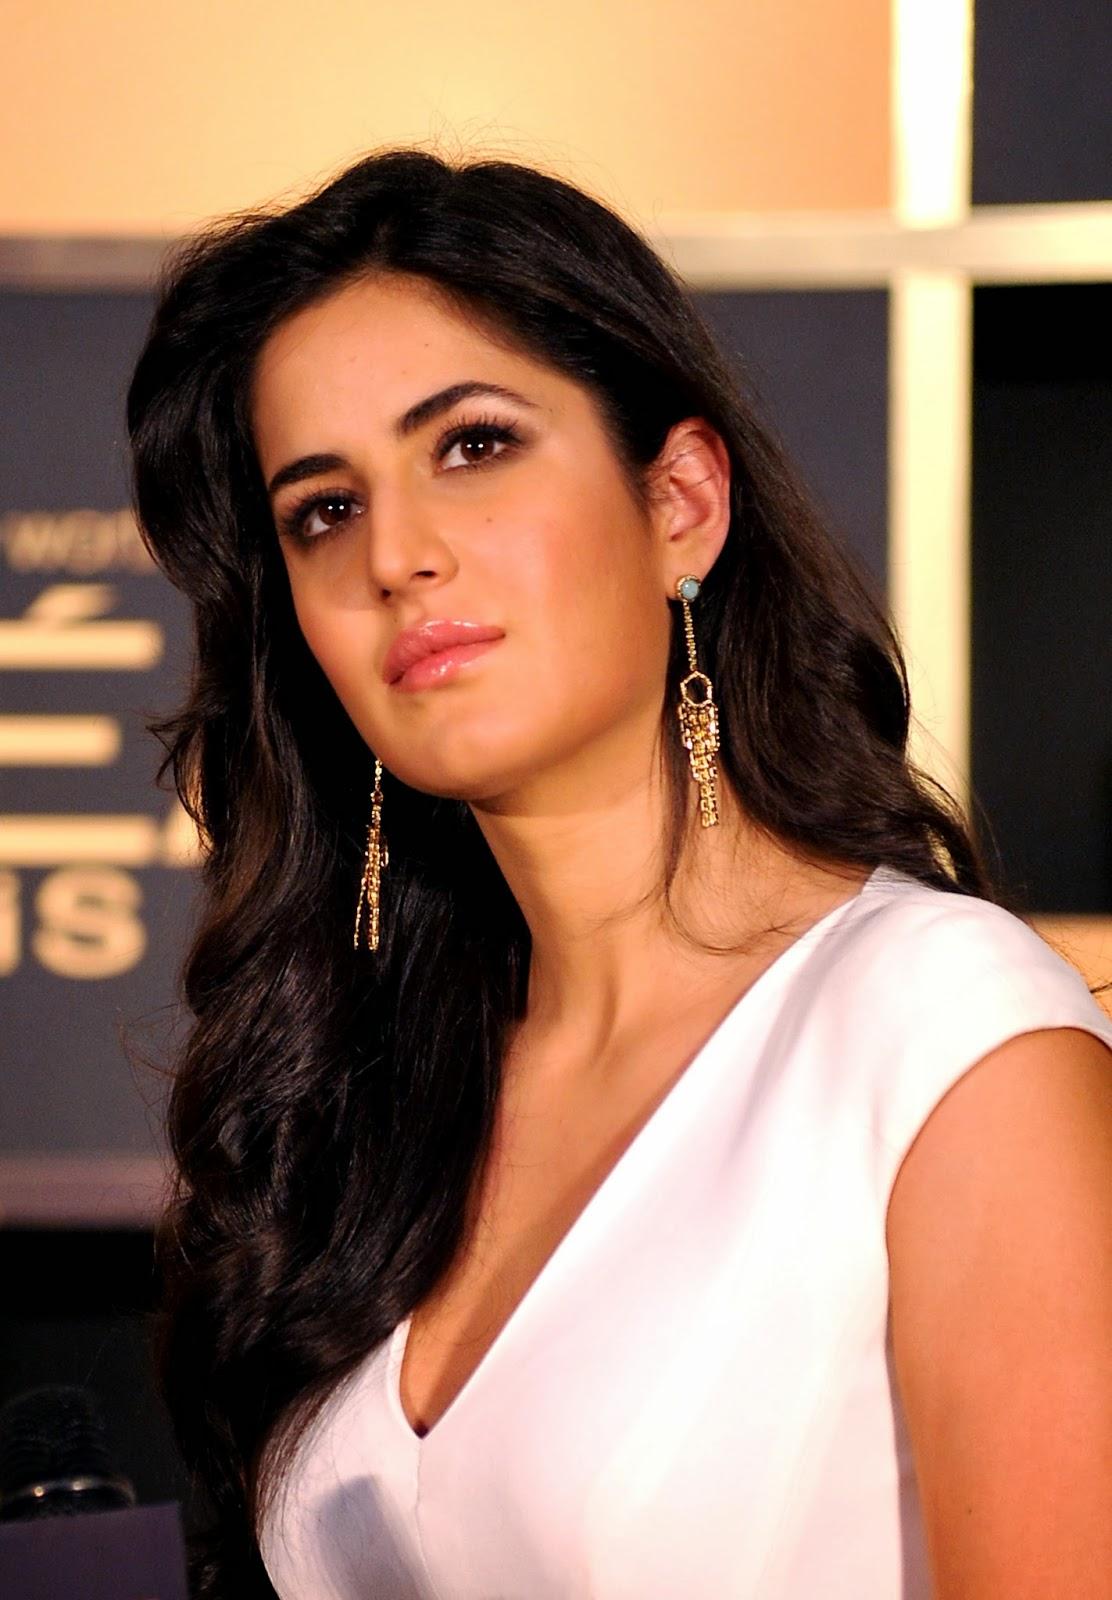 Katrina Kaif, Freida Pinto, Aishwarya Rai, Bachchan, Sonam Kapoor, L'Oreal Paris, Ambassador, Cosmetic, Brand, Product, India, Showbiz, Bollywood, Stars, Model,